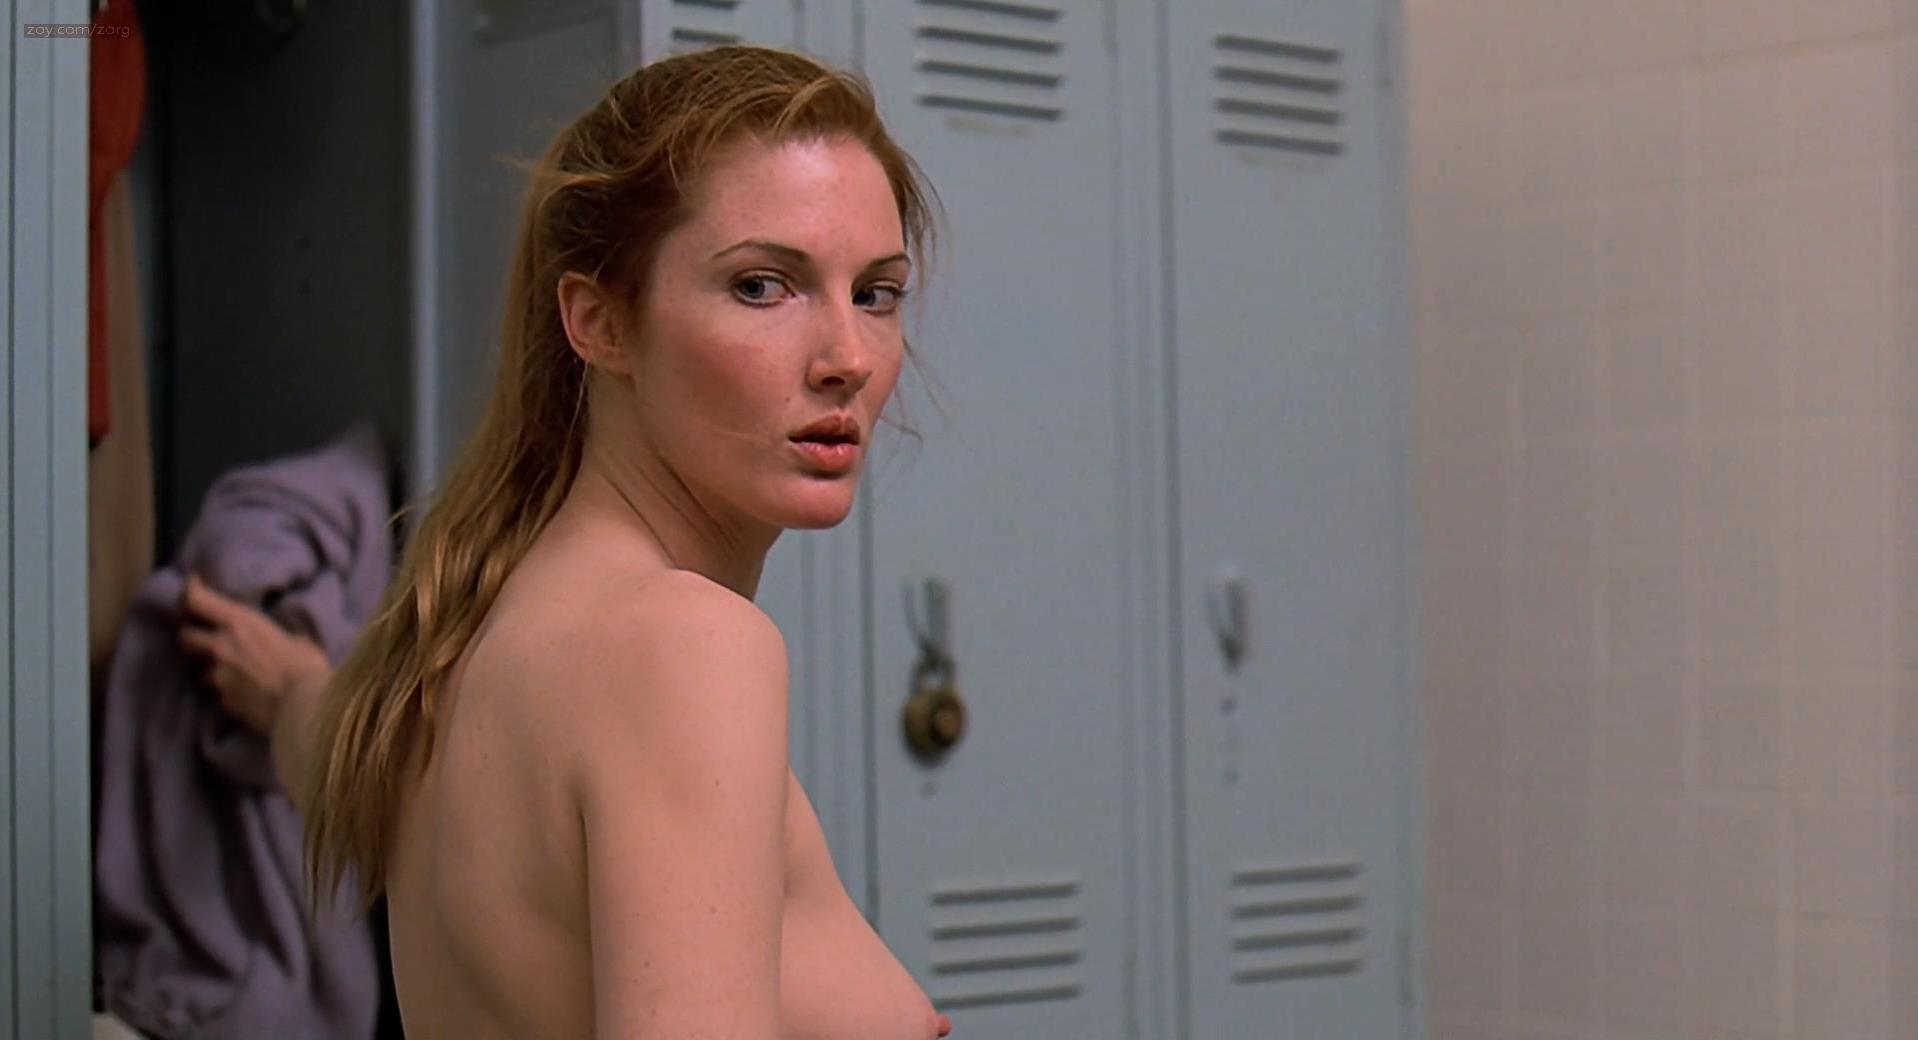 Poppy montgomery as porn star